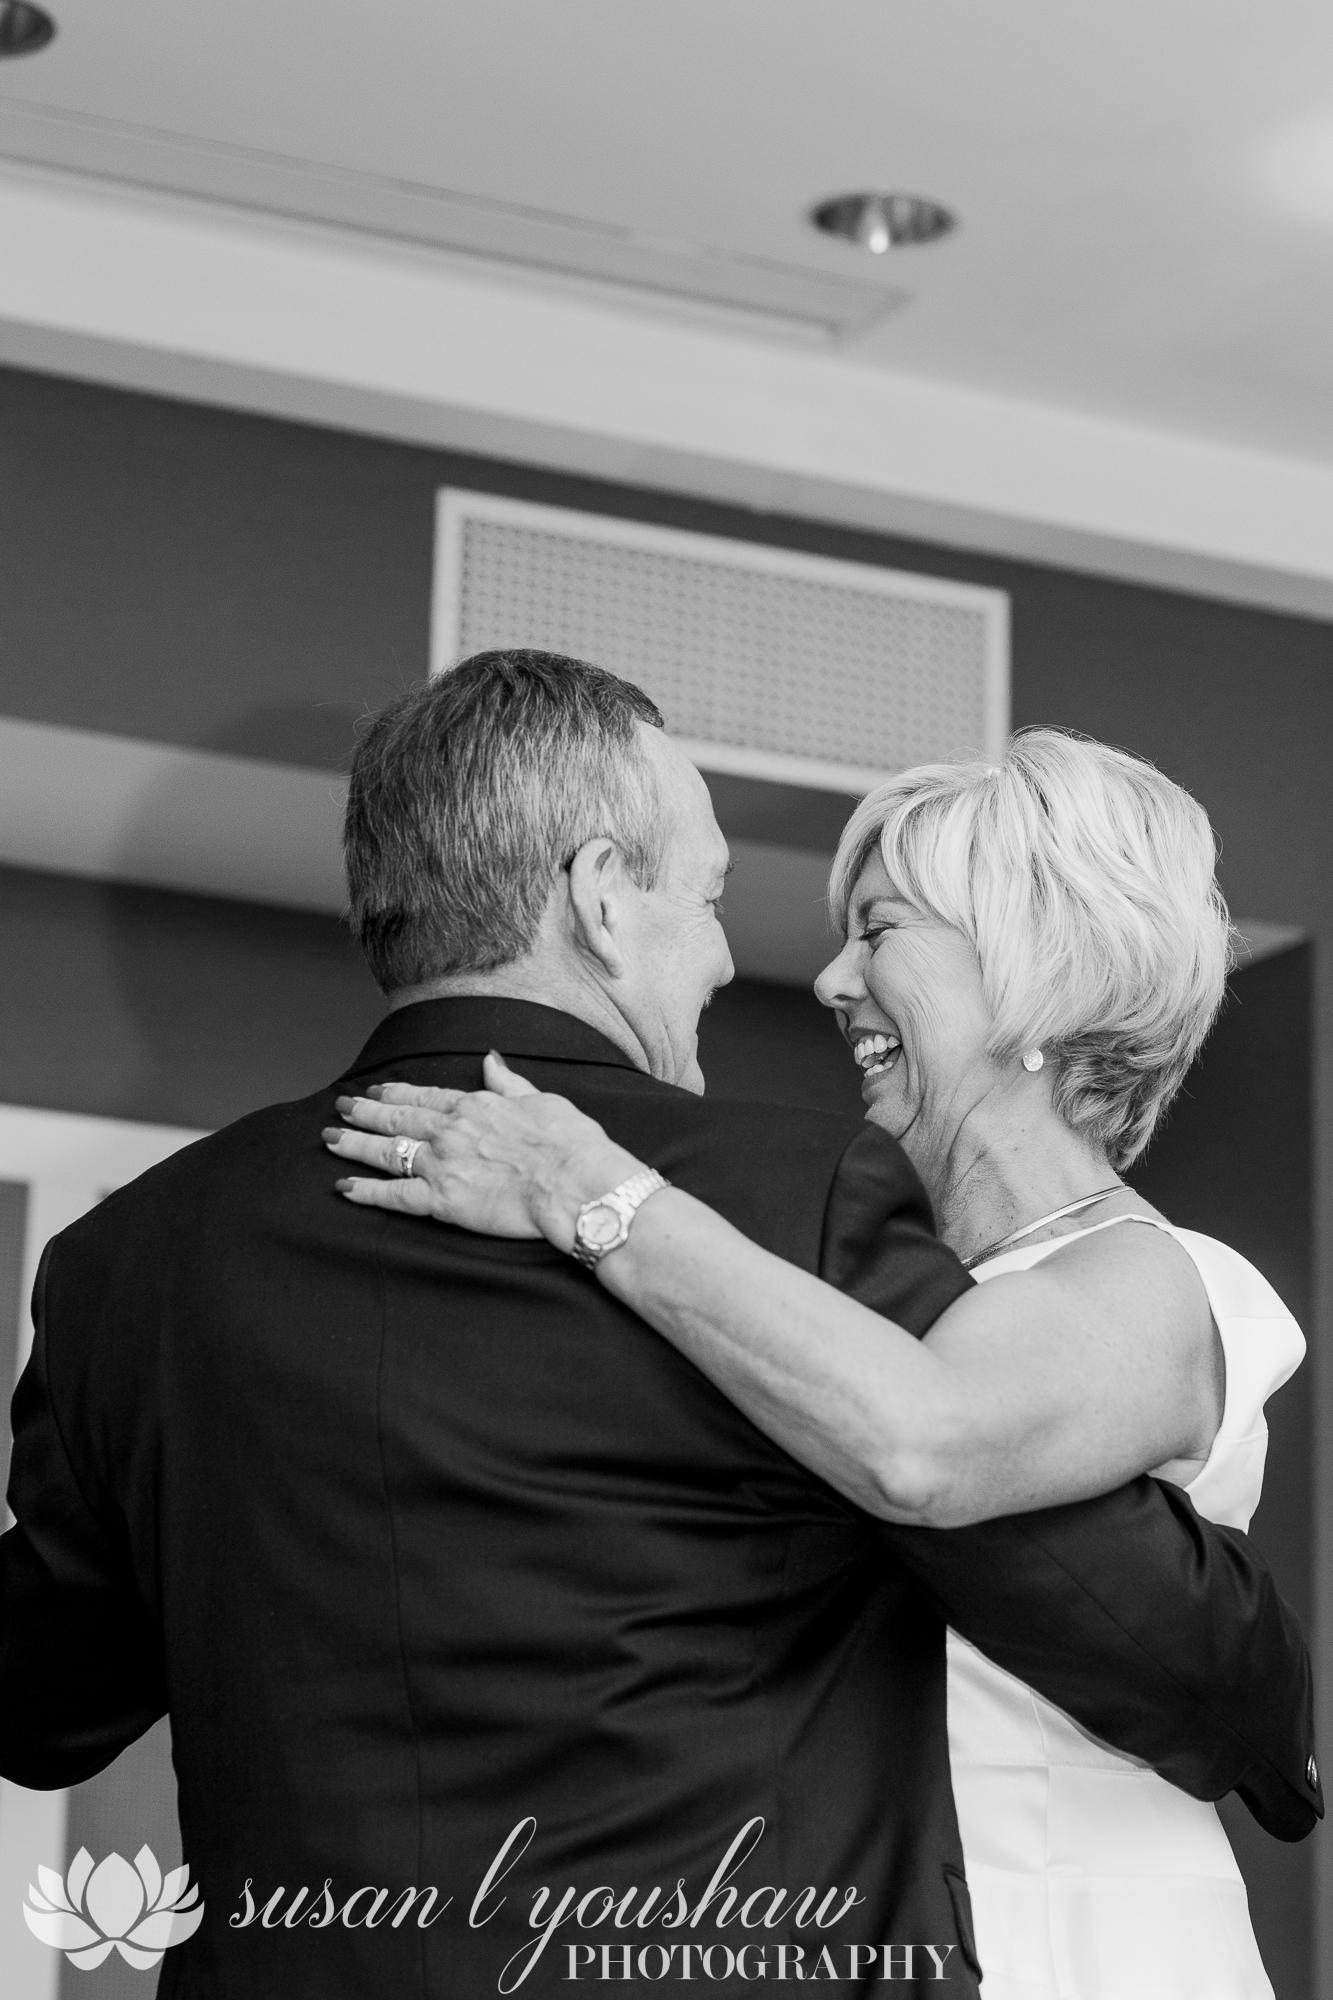 BLOG Carolyn Adams and Jim McCune 07-04-2018 SLY Photography-155.jpg